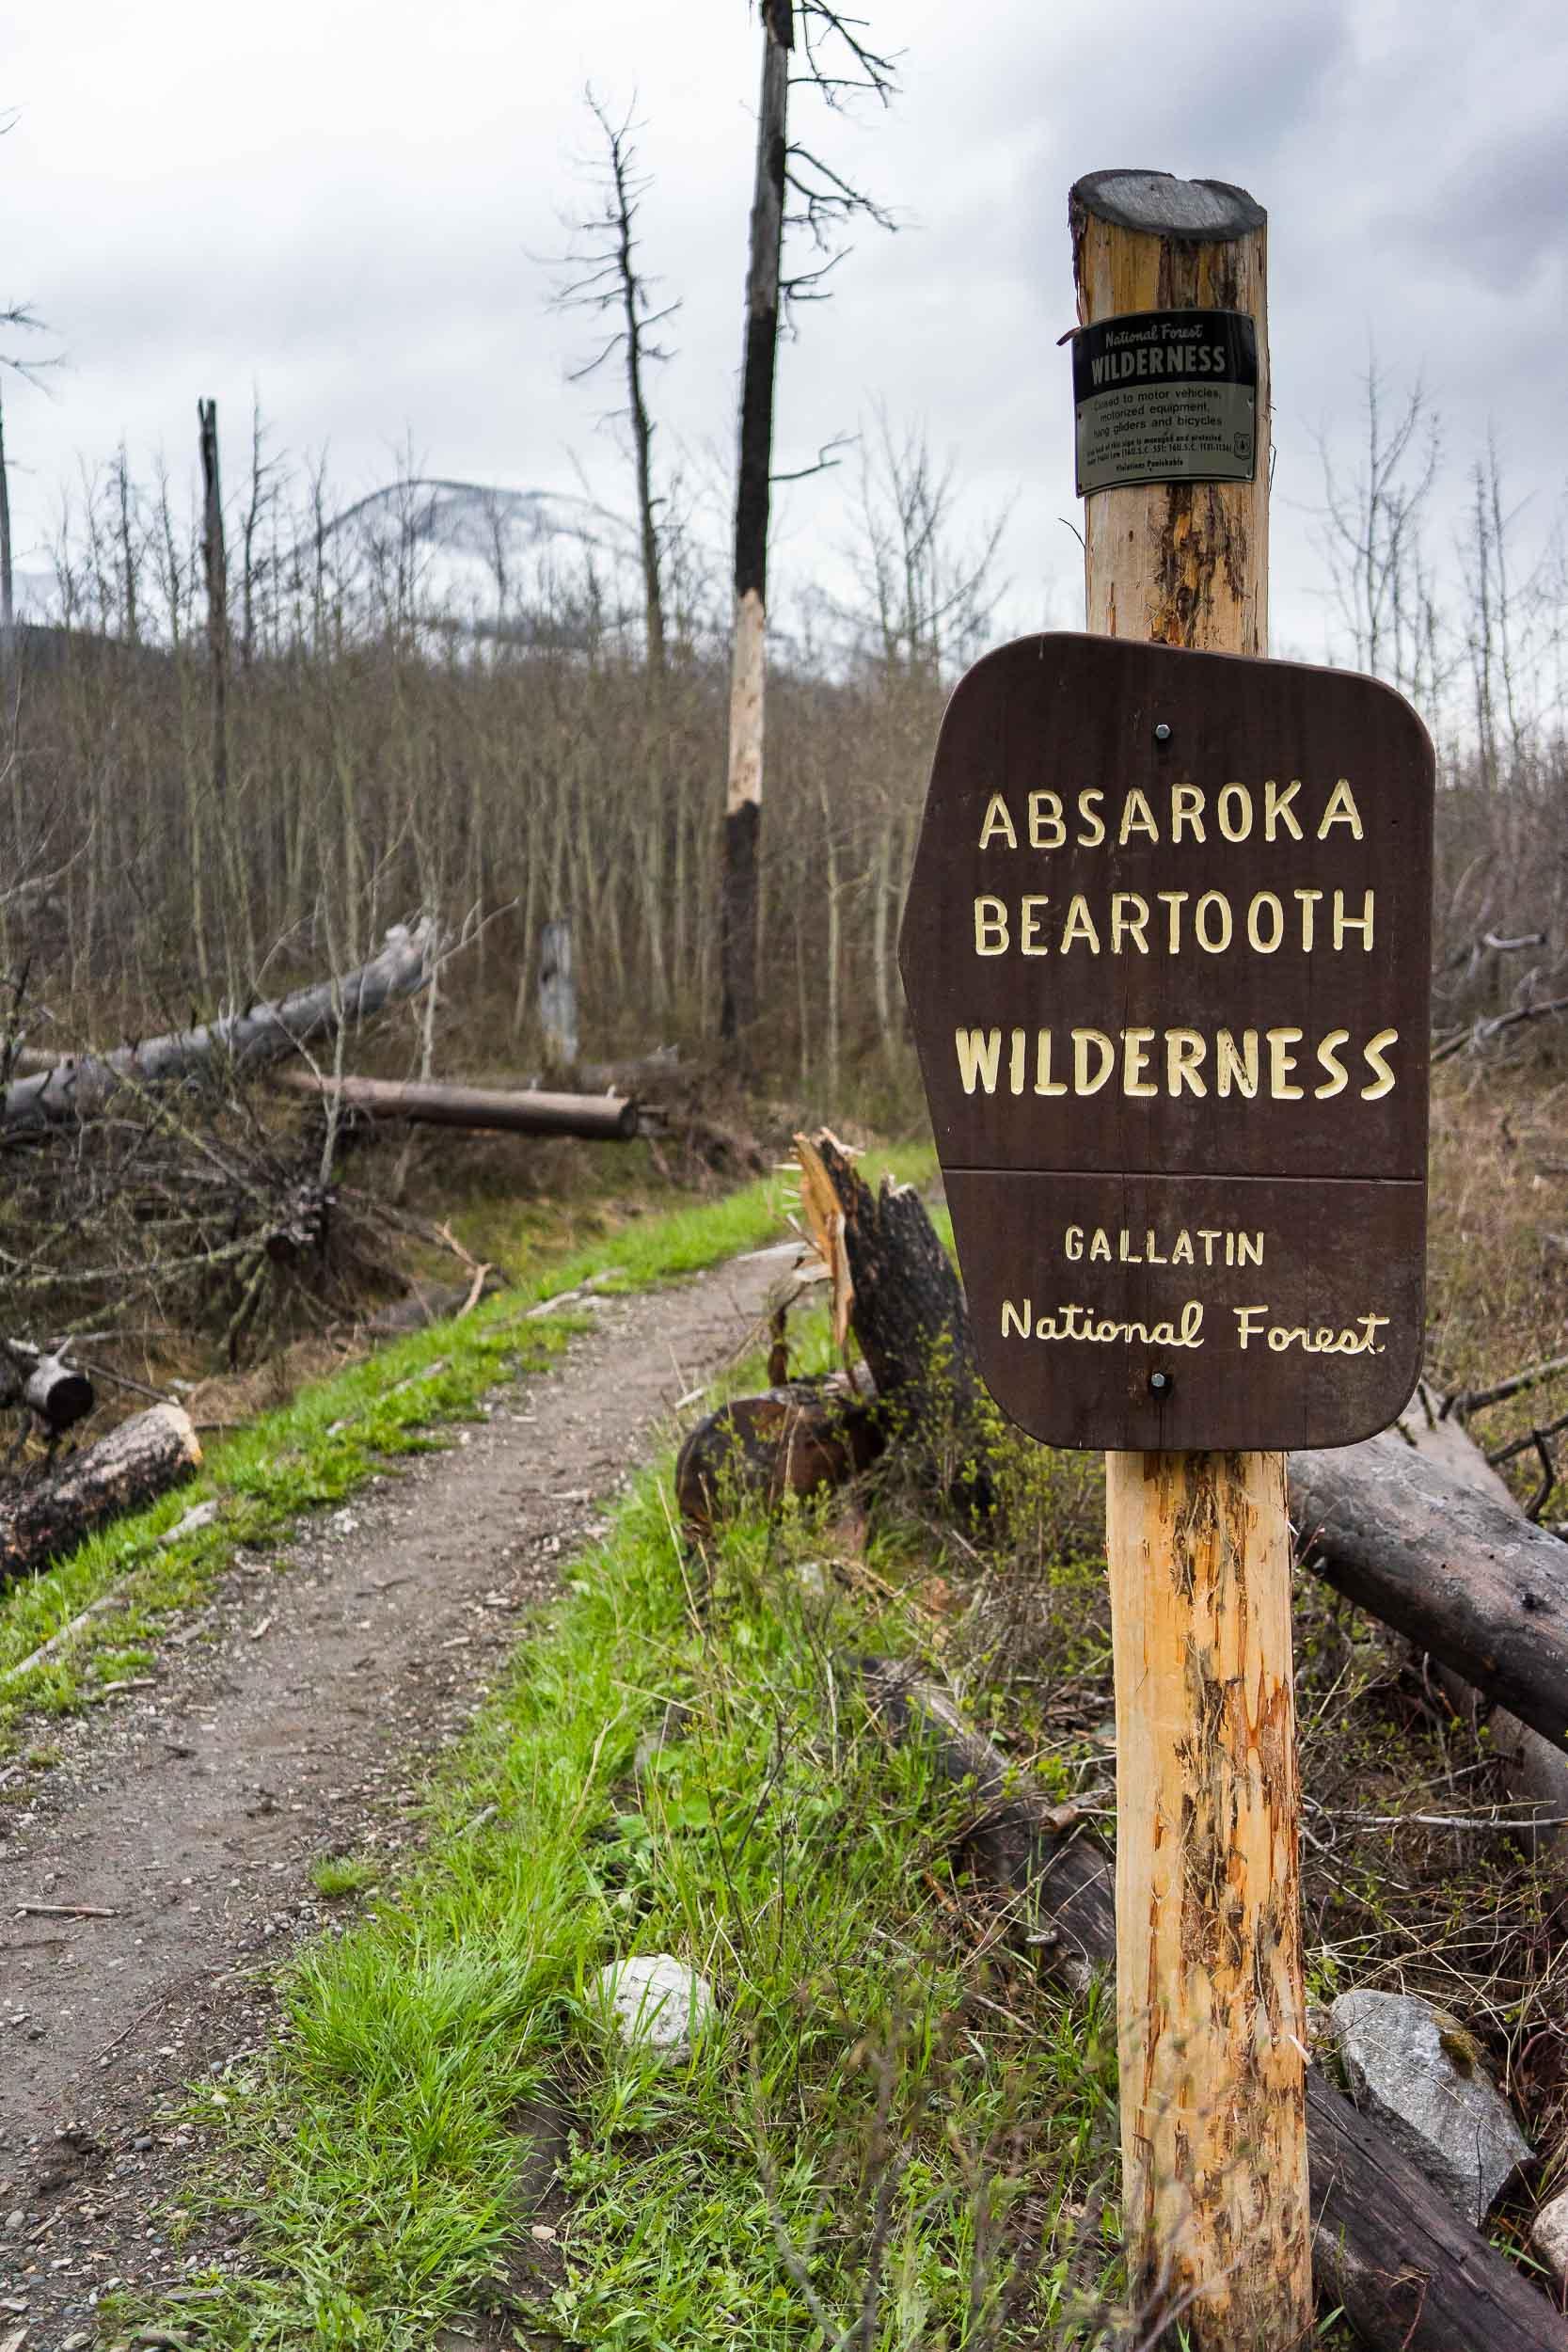 West Boulder Meadows in Absaroka Range near Big Timber, Montana